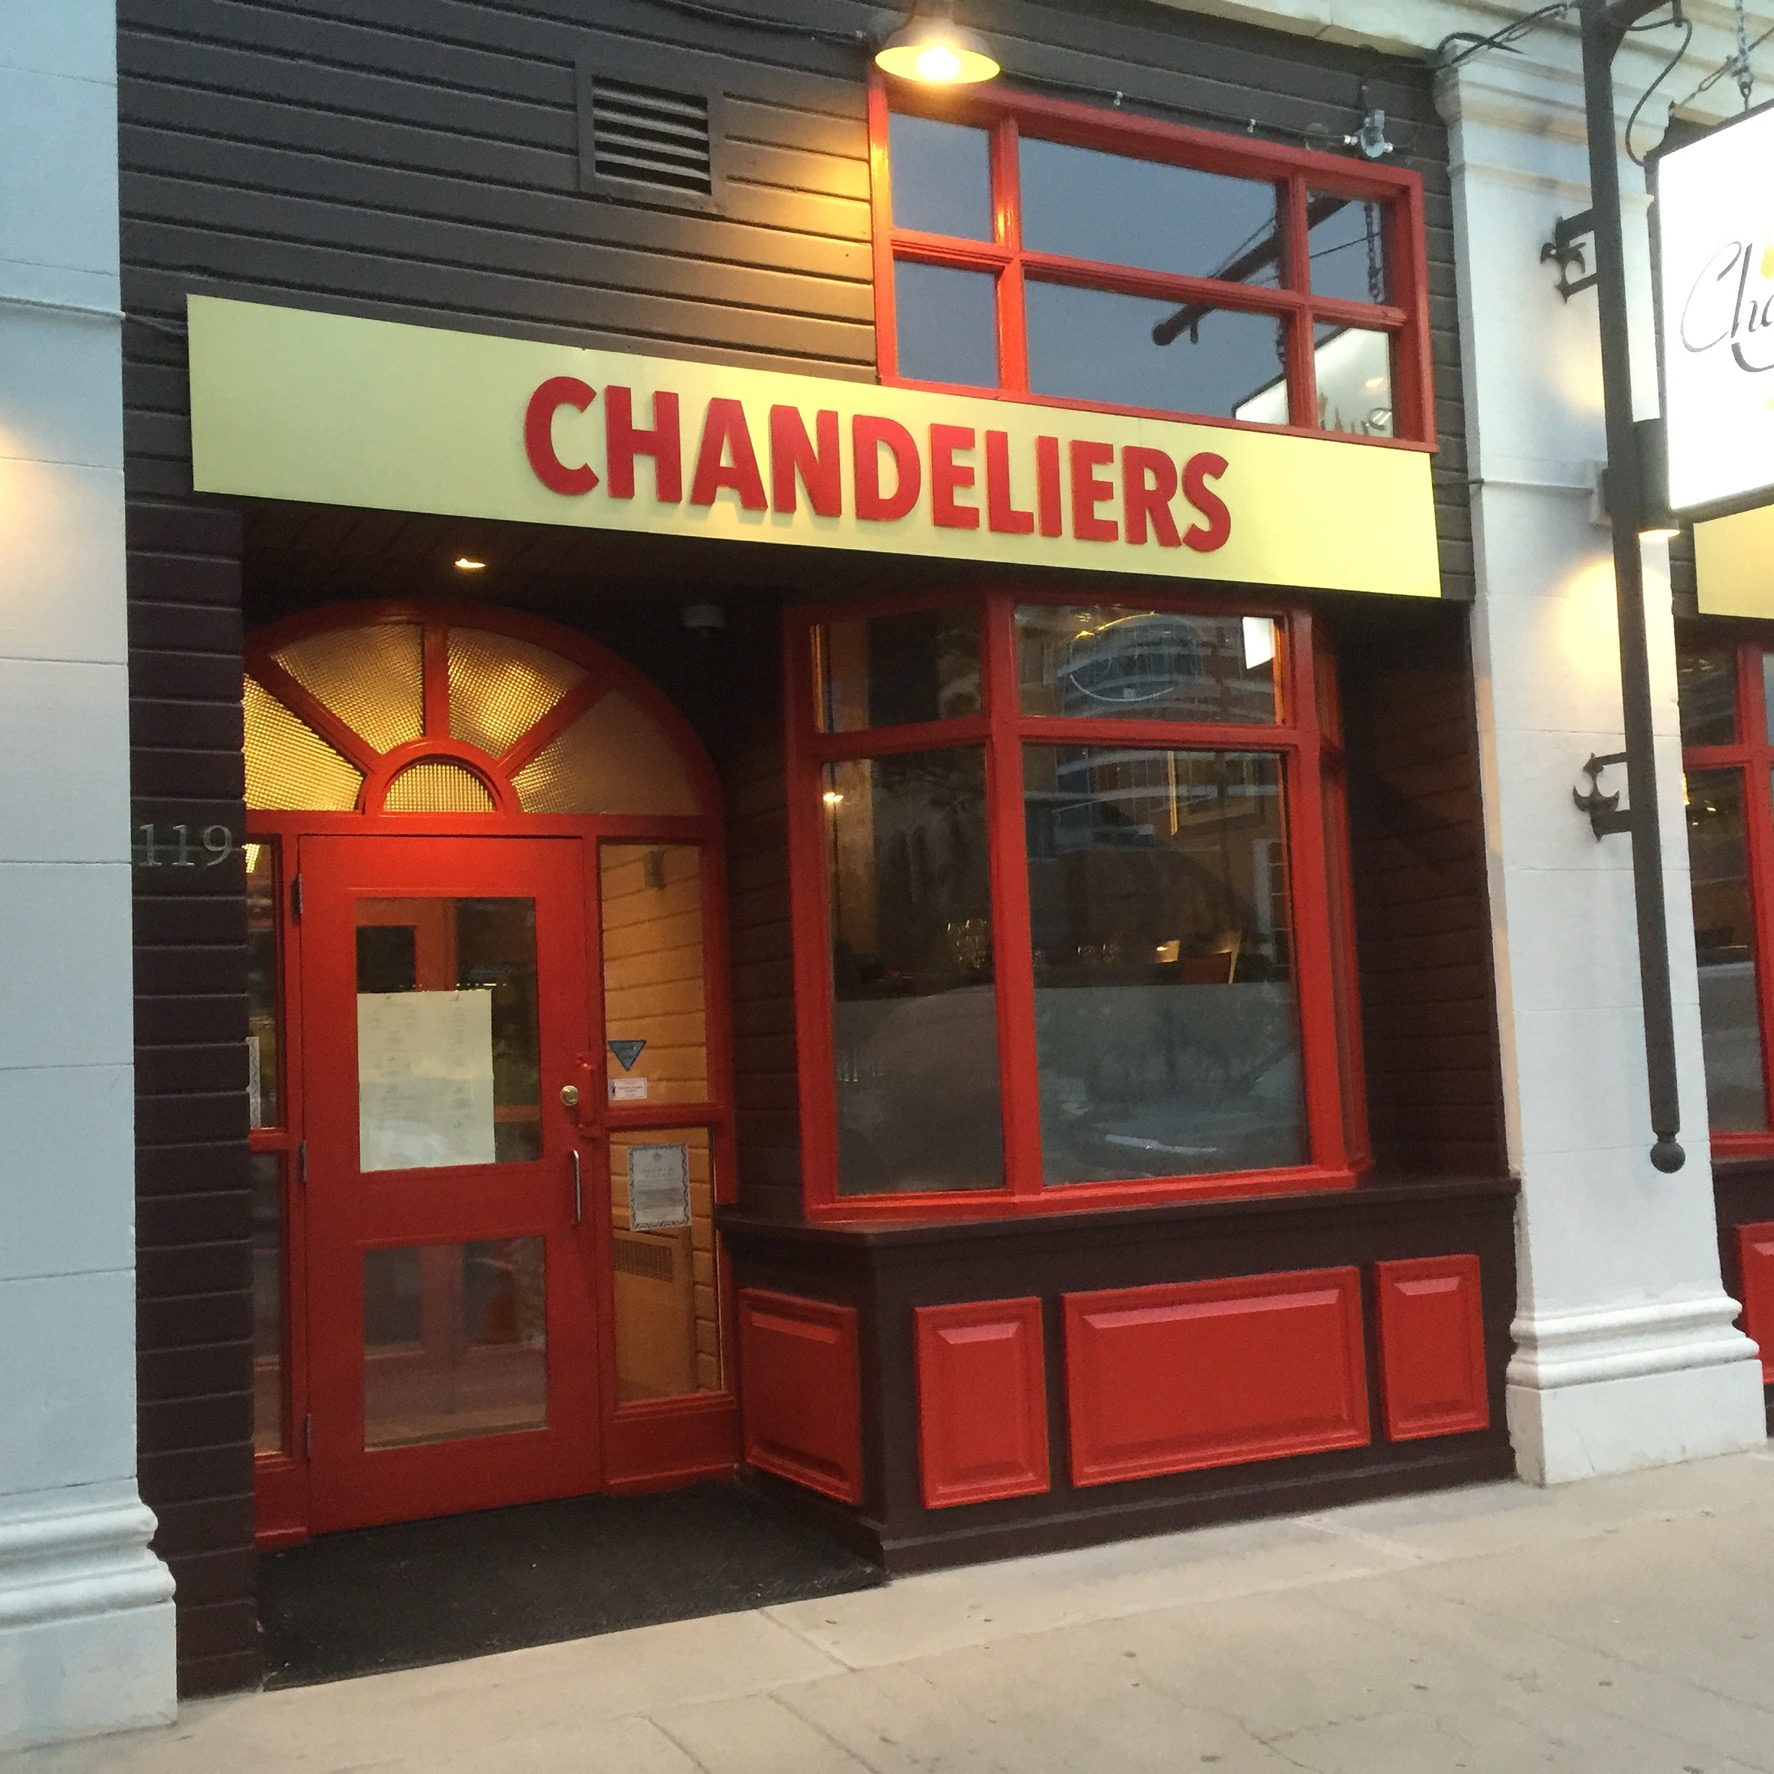 Chandelier restaurant saskatoon musethecollective chandeliers fine dining saskatoon sk s7k 0k1 arubaitofo Gallery